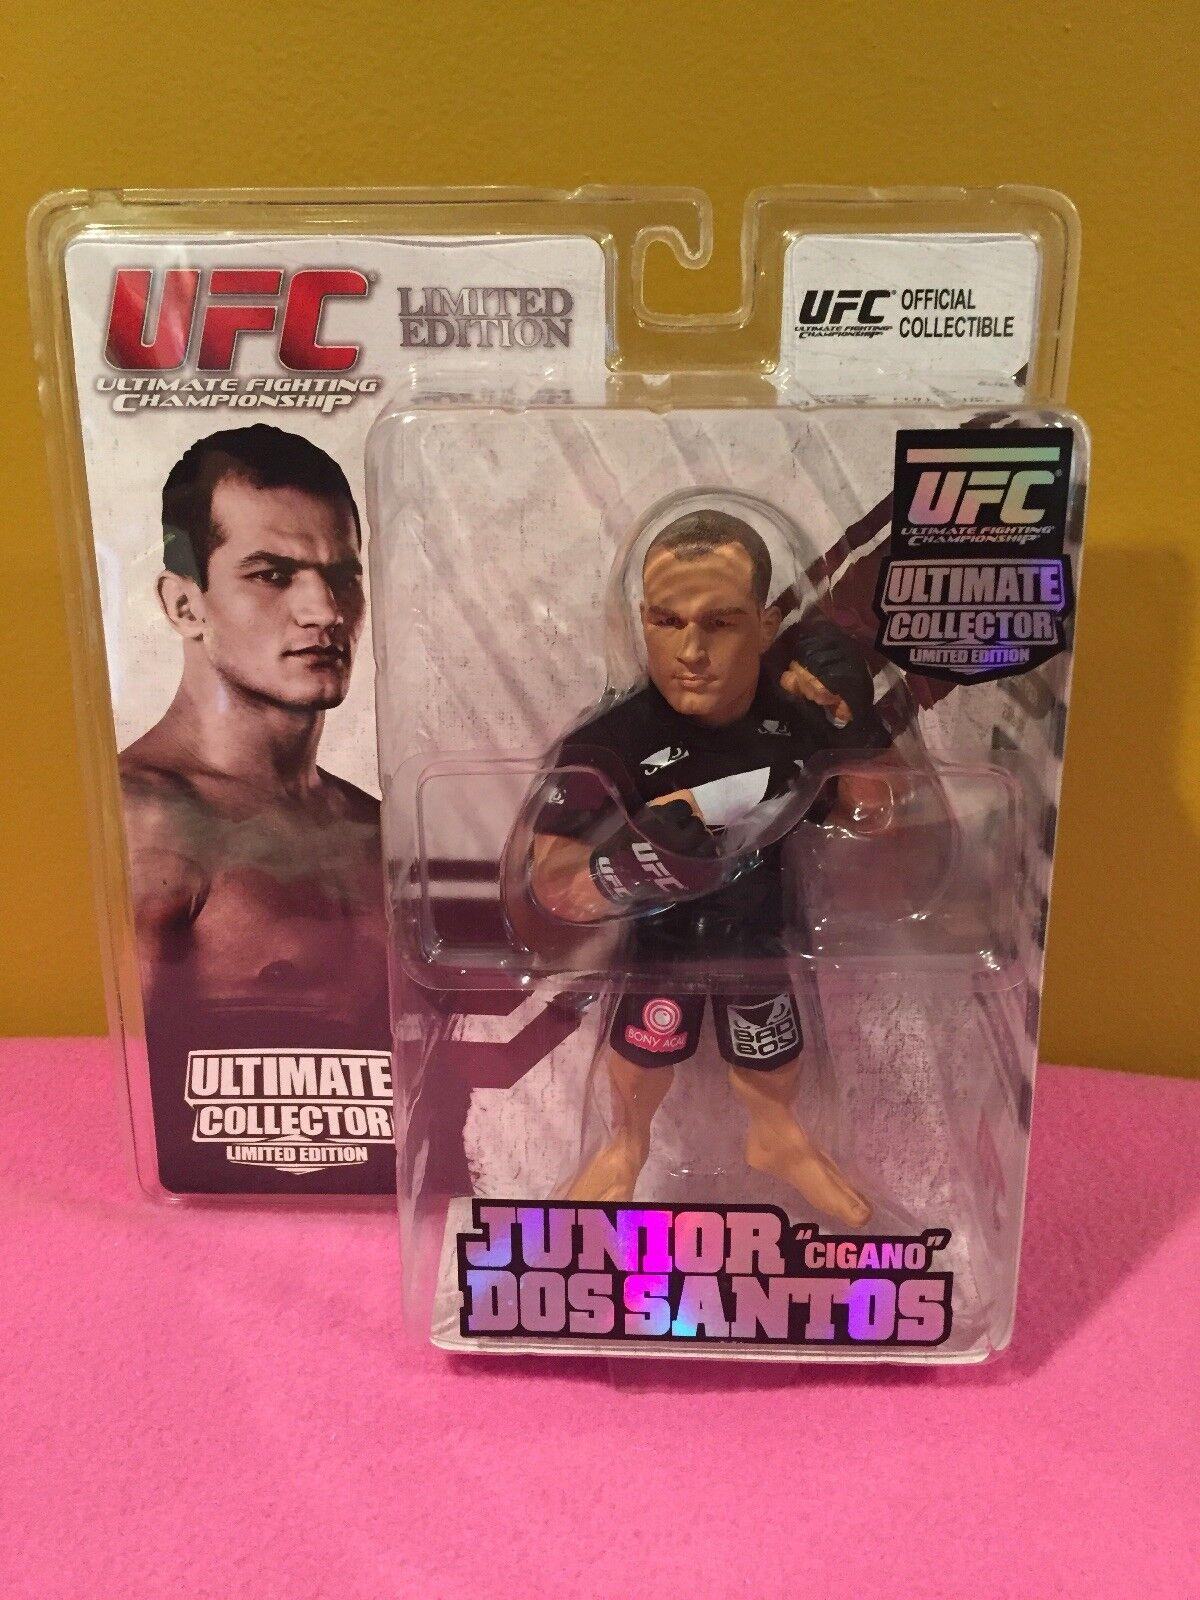 2011 UFC Ultimate Collector Junior Dos Santos Limited Edition Round 5 Figure